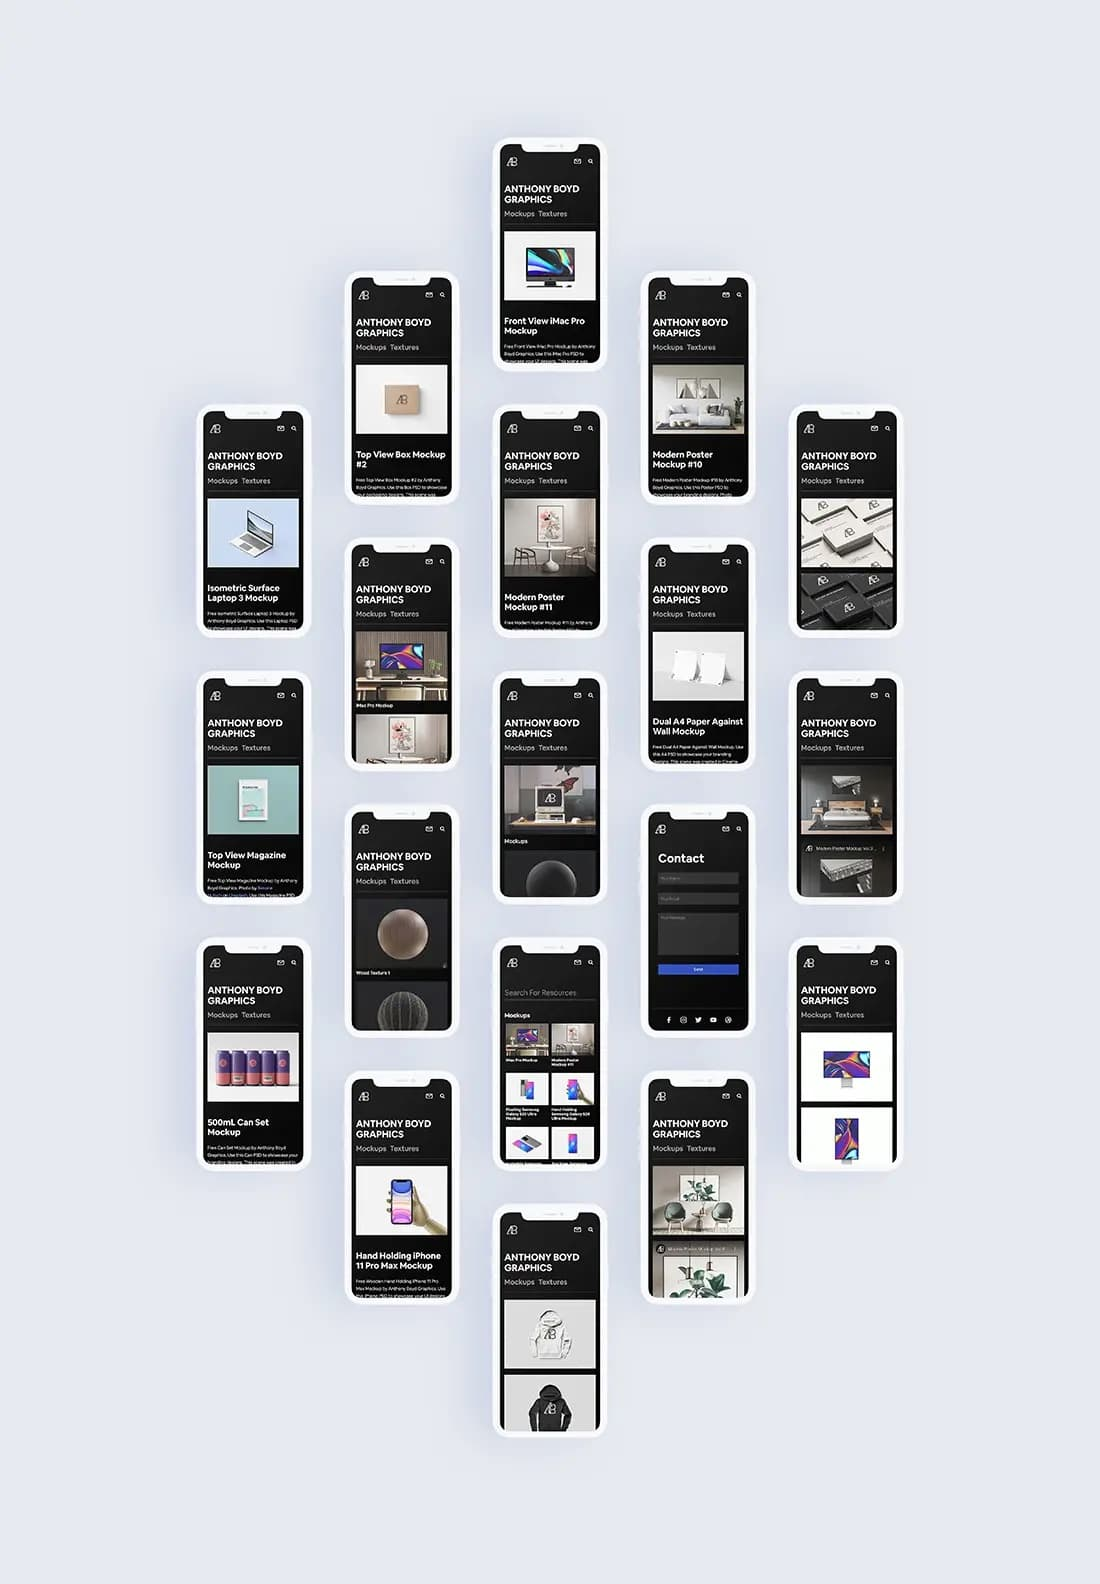 Free iPhone Screen Set PSD Mockup